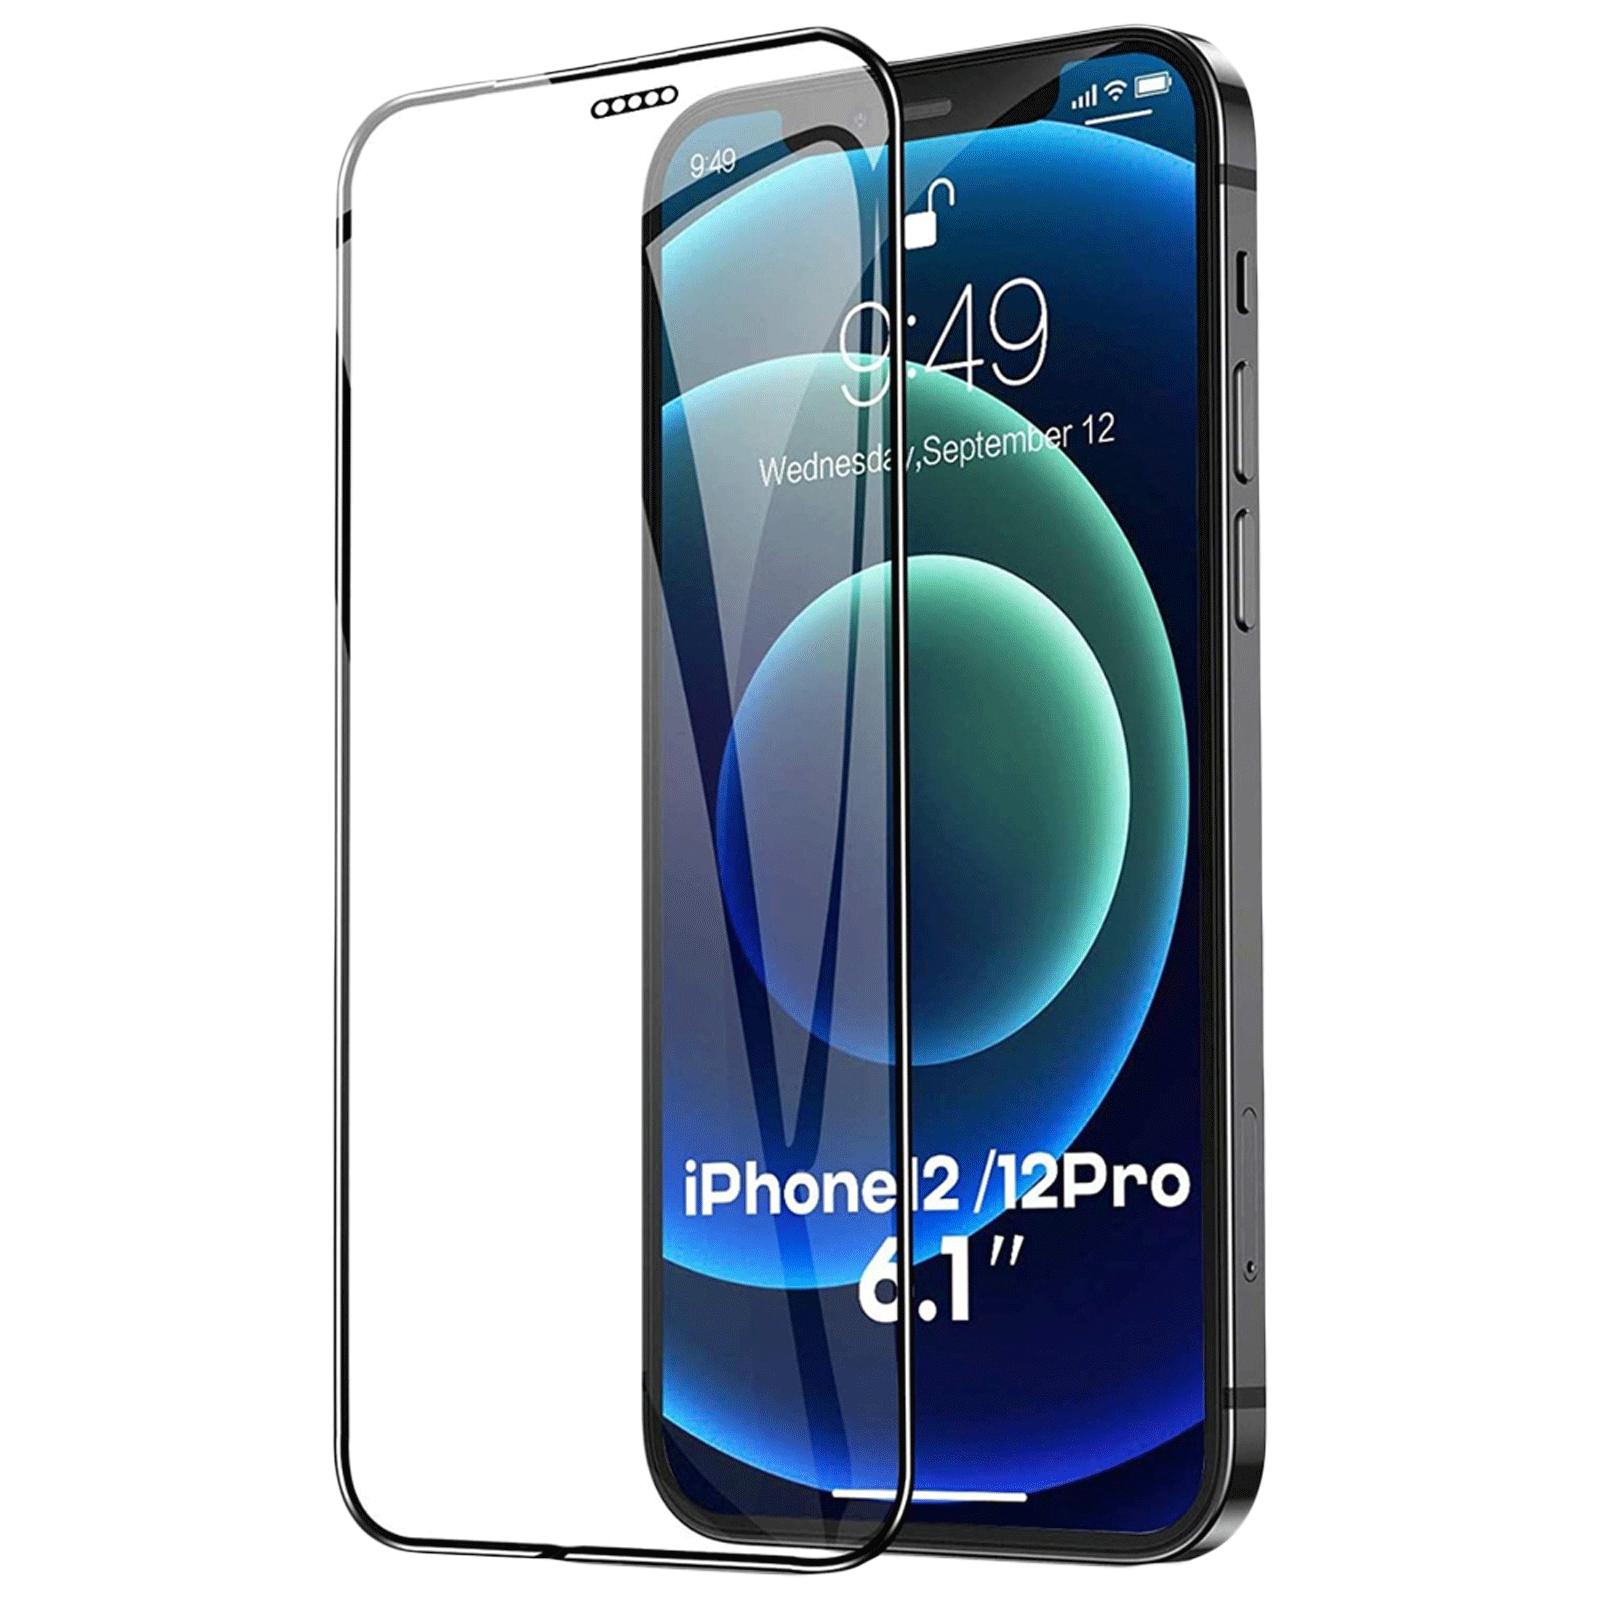 Dr. Vaku Dustfilter 3D Screen Protector For Apple iPhone 12 & iPhone 12 Pro (9H Hardness, VAKU-IPH12P-DUSTBL, Black)_1